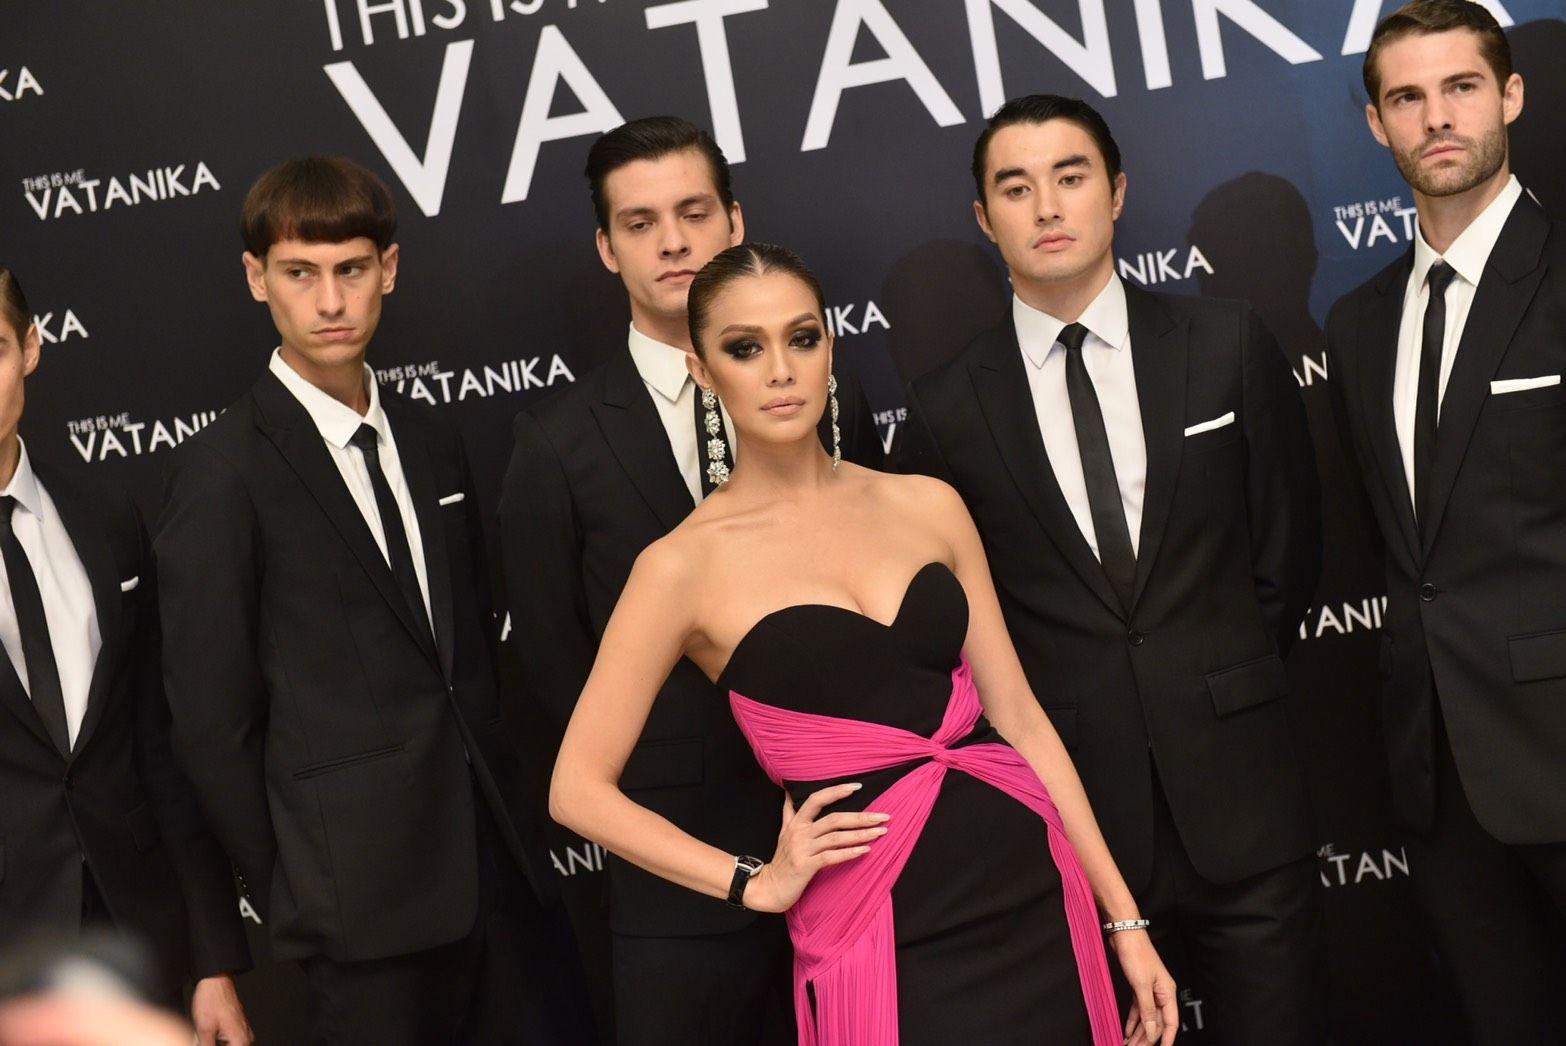 'This Is Me Vatanika' Returns For Season 2 On July 10